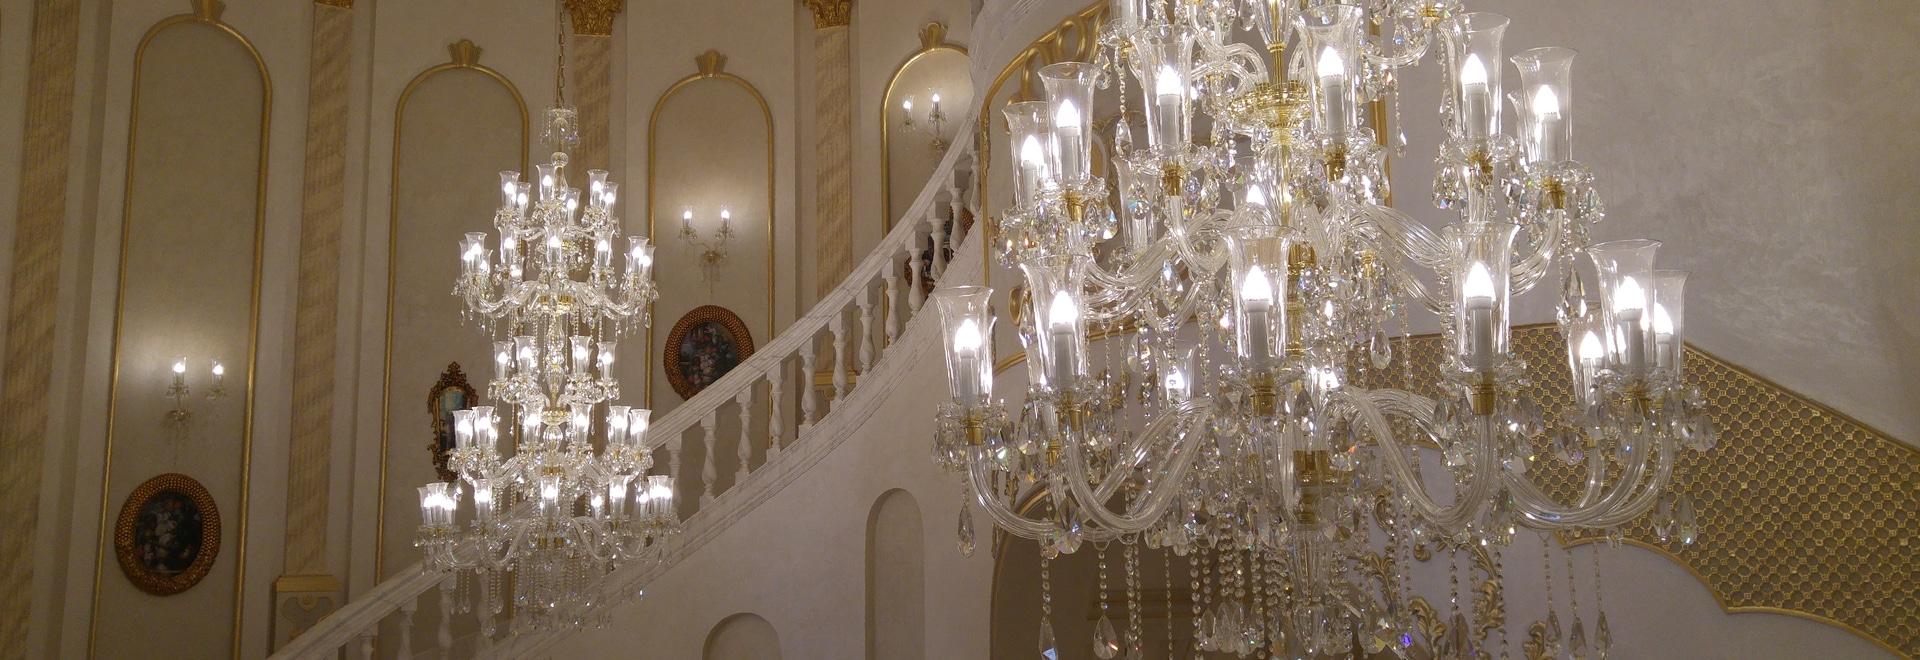 Palace Doha